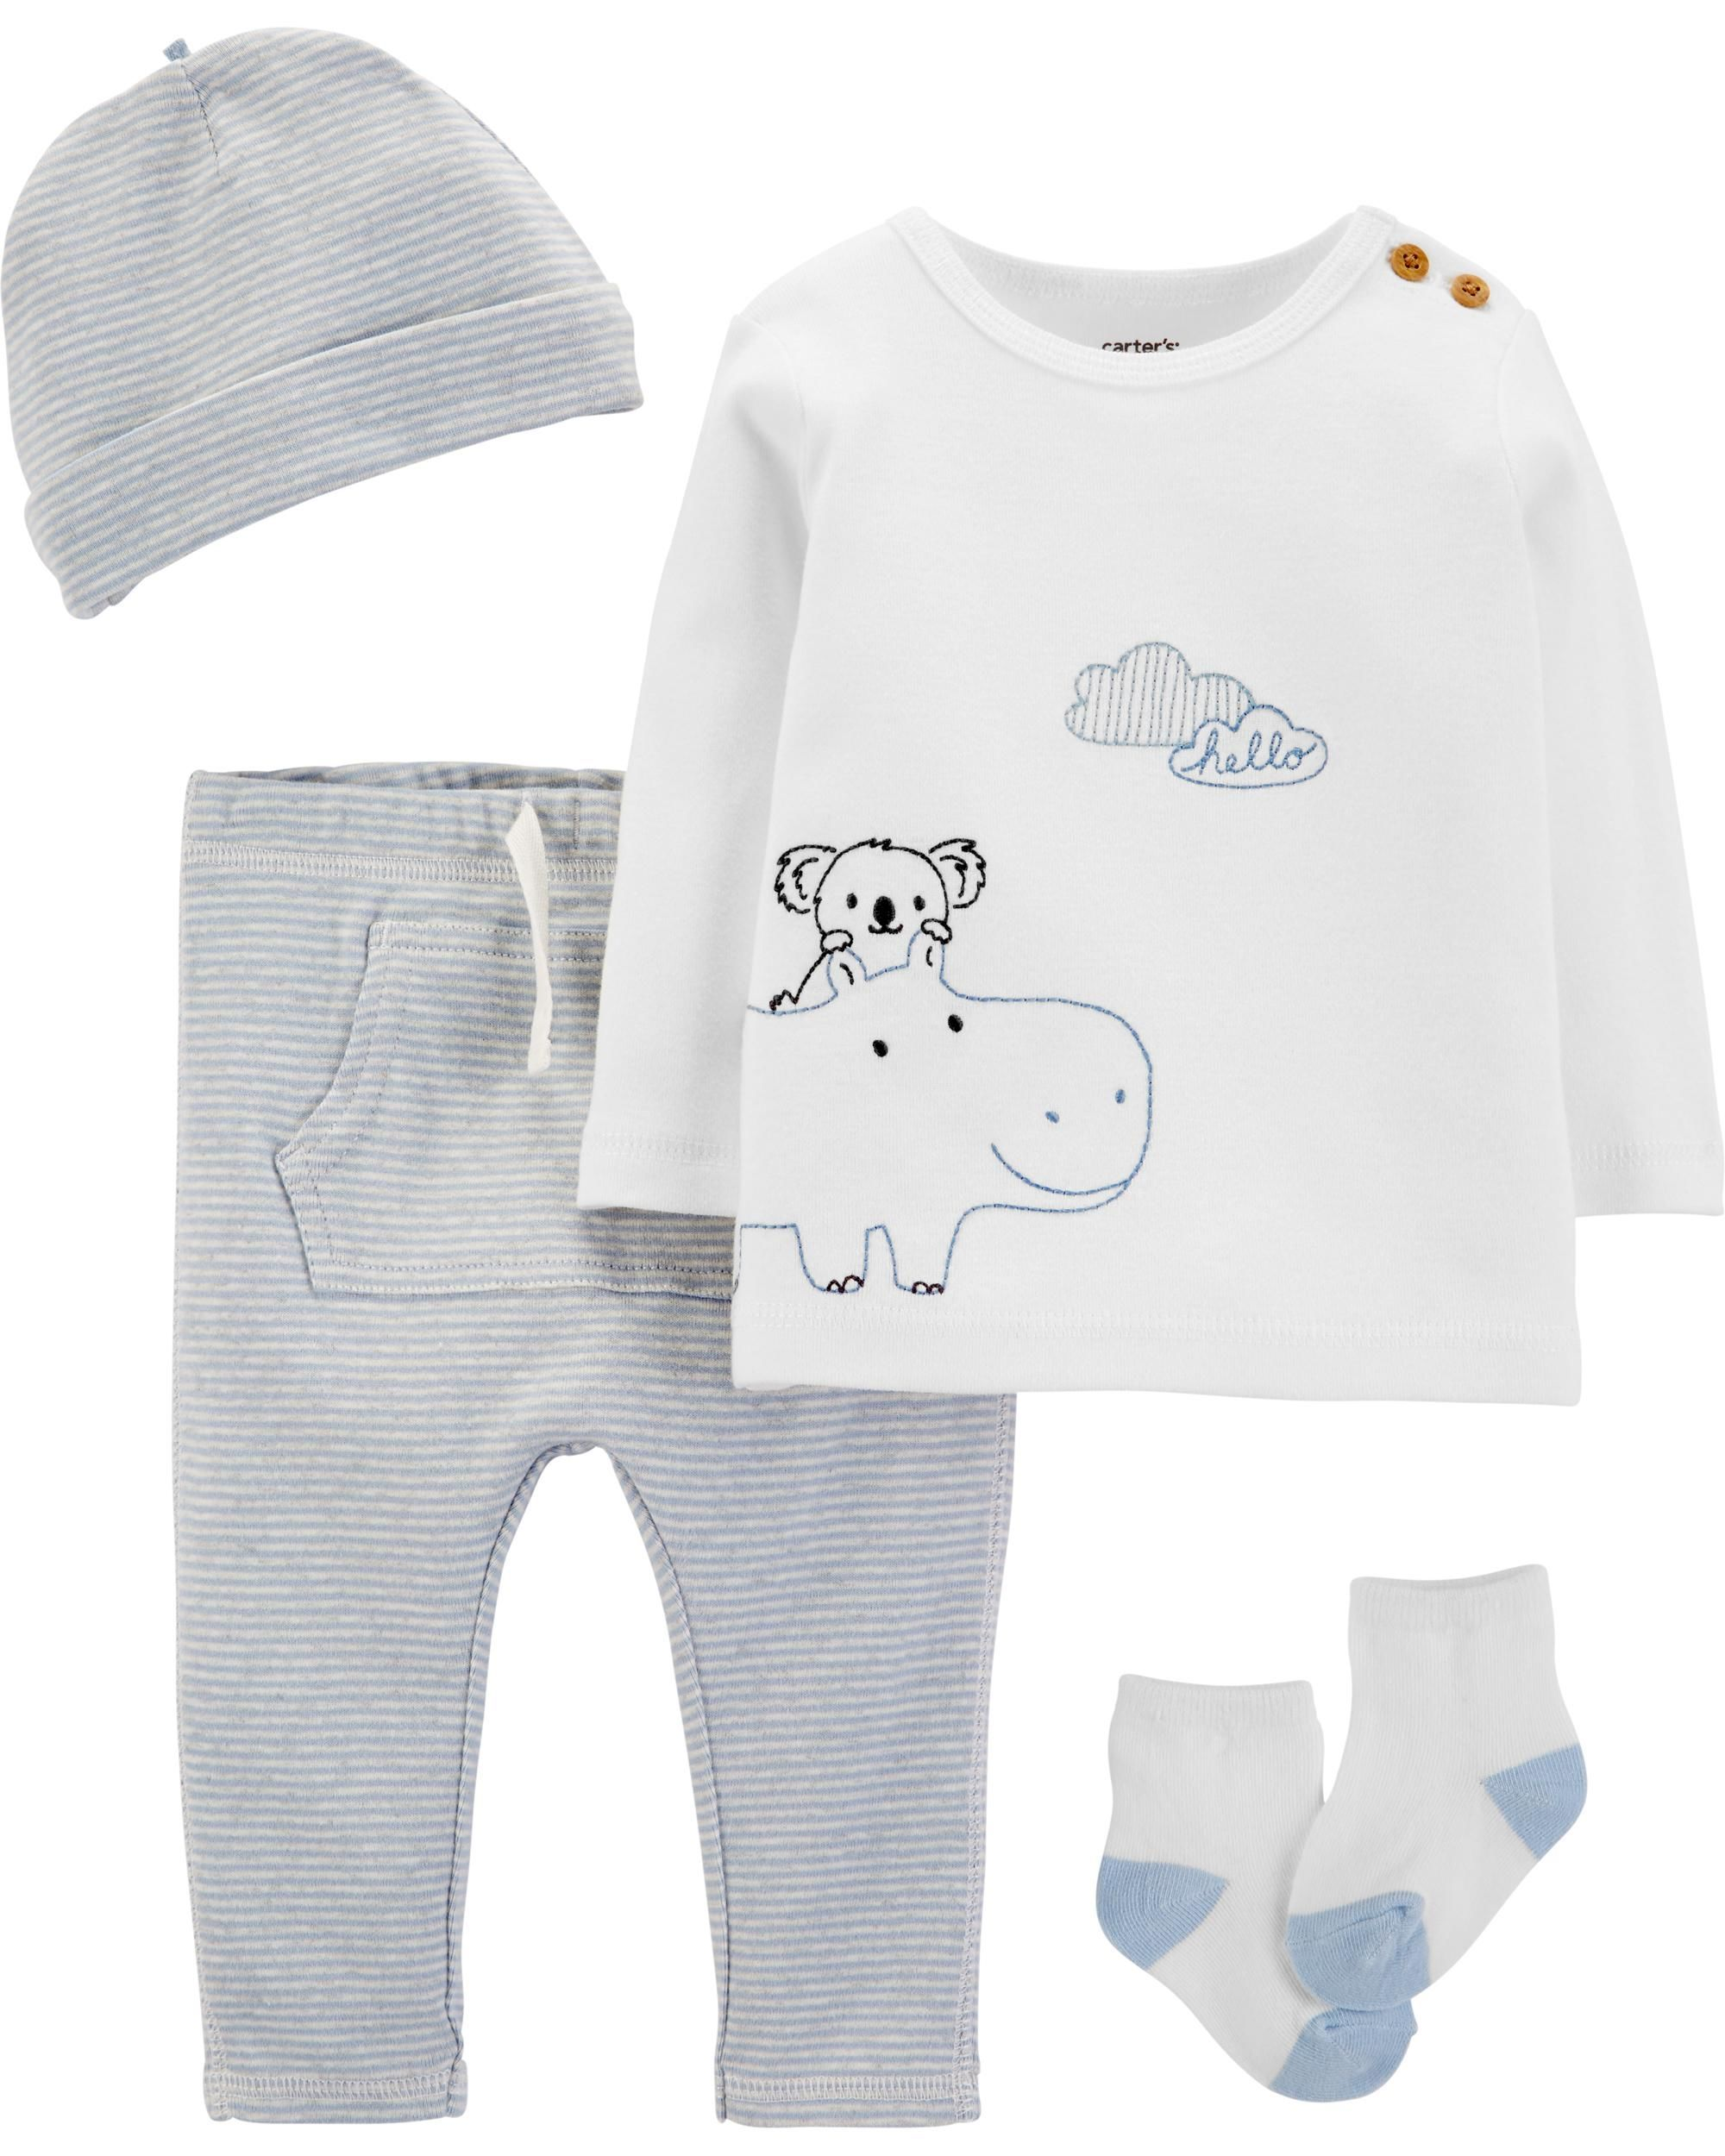 5b1a29c20 4-Piece Koala Take-Me-Home Set   Sweet Classic Baby/Toddler ...